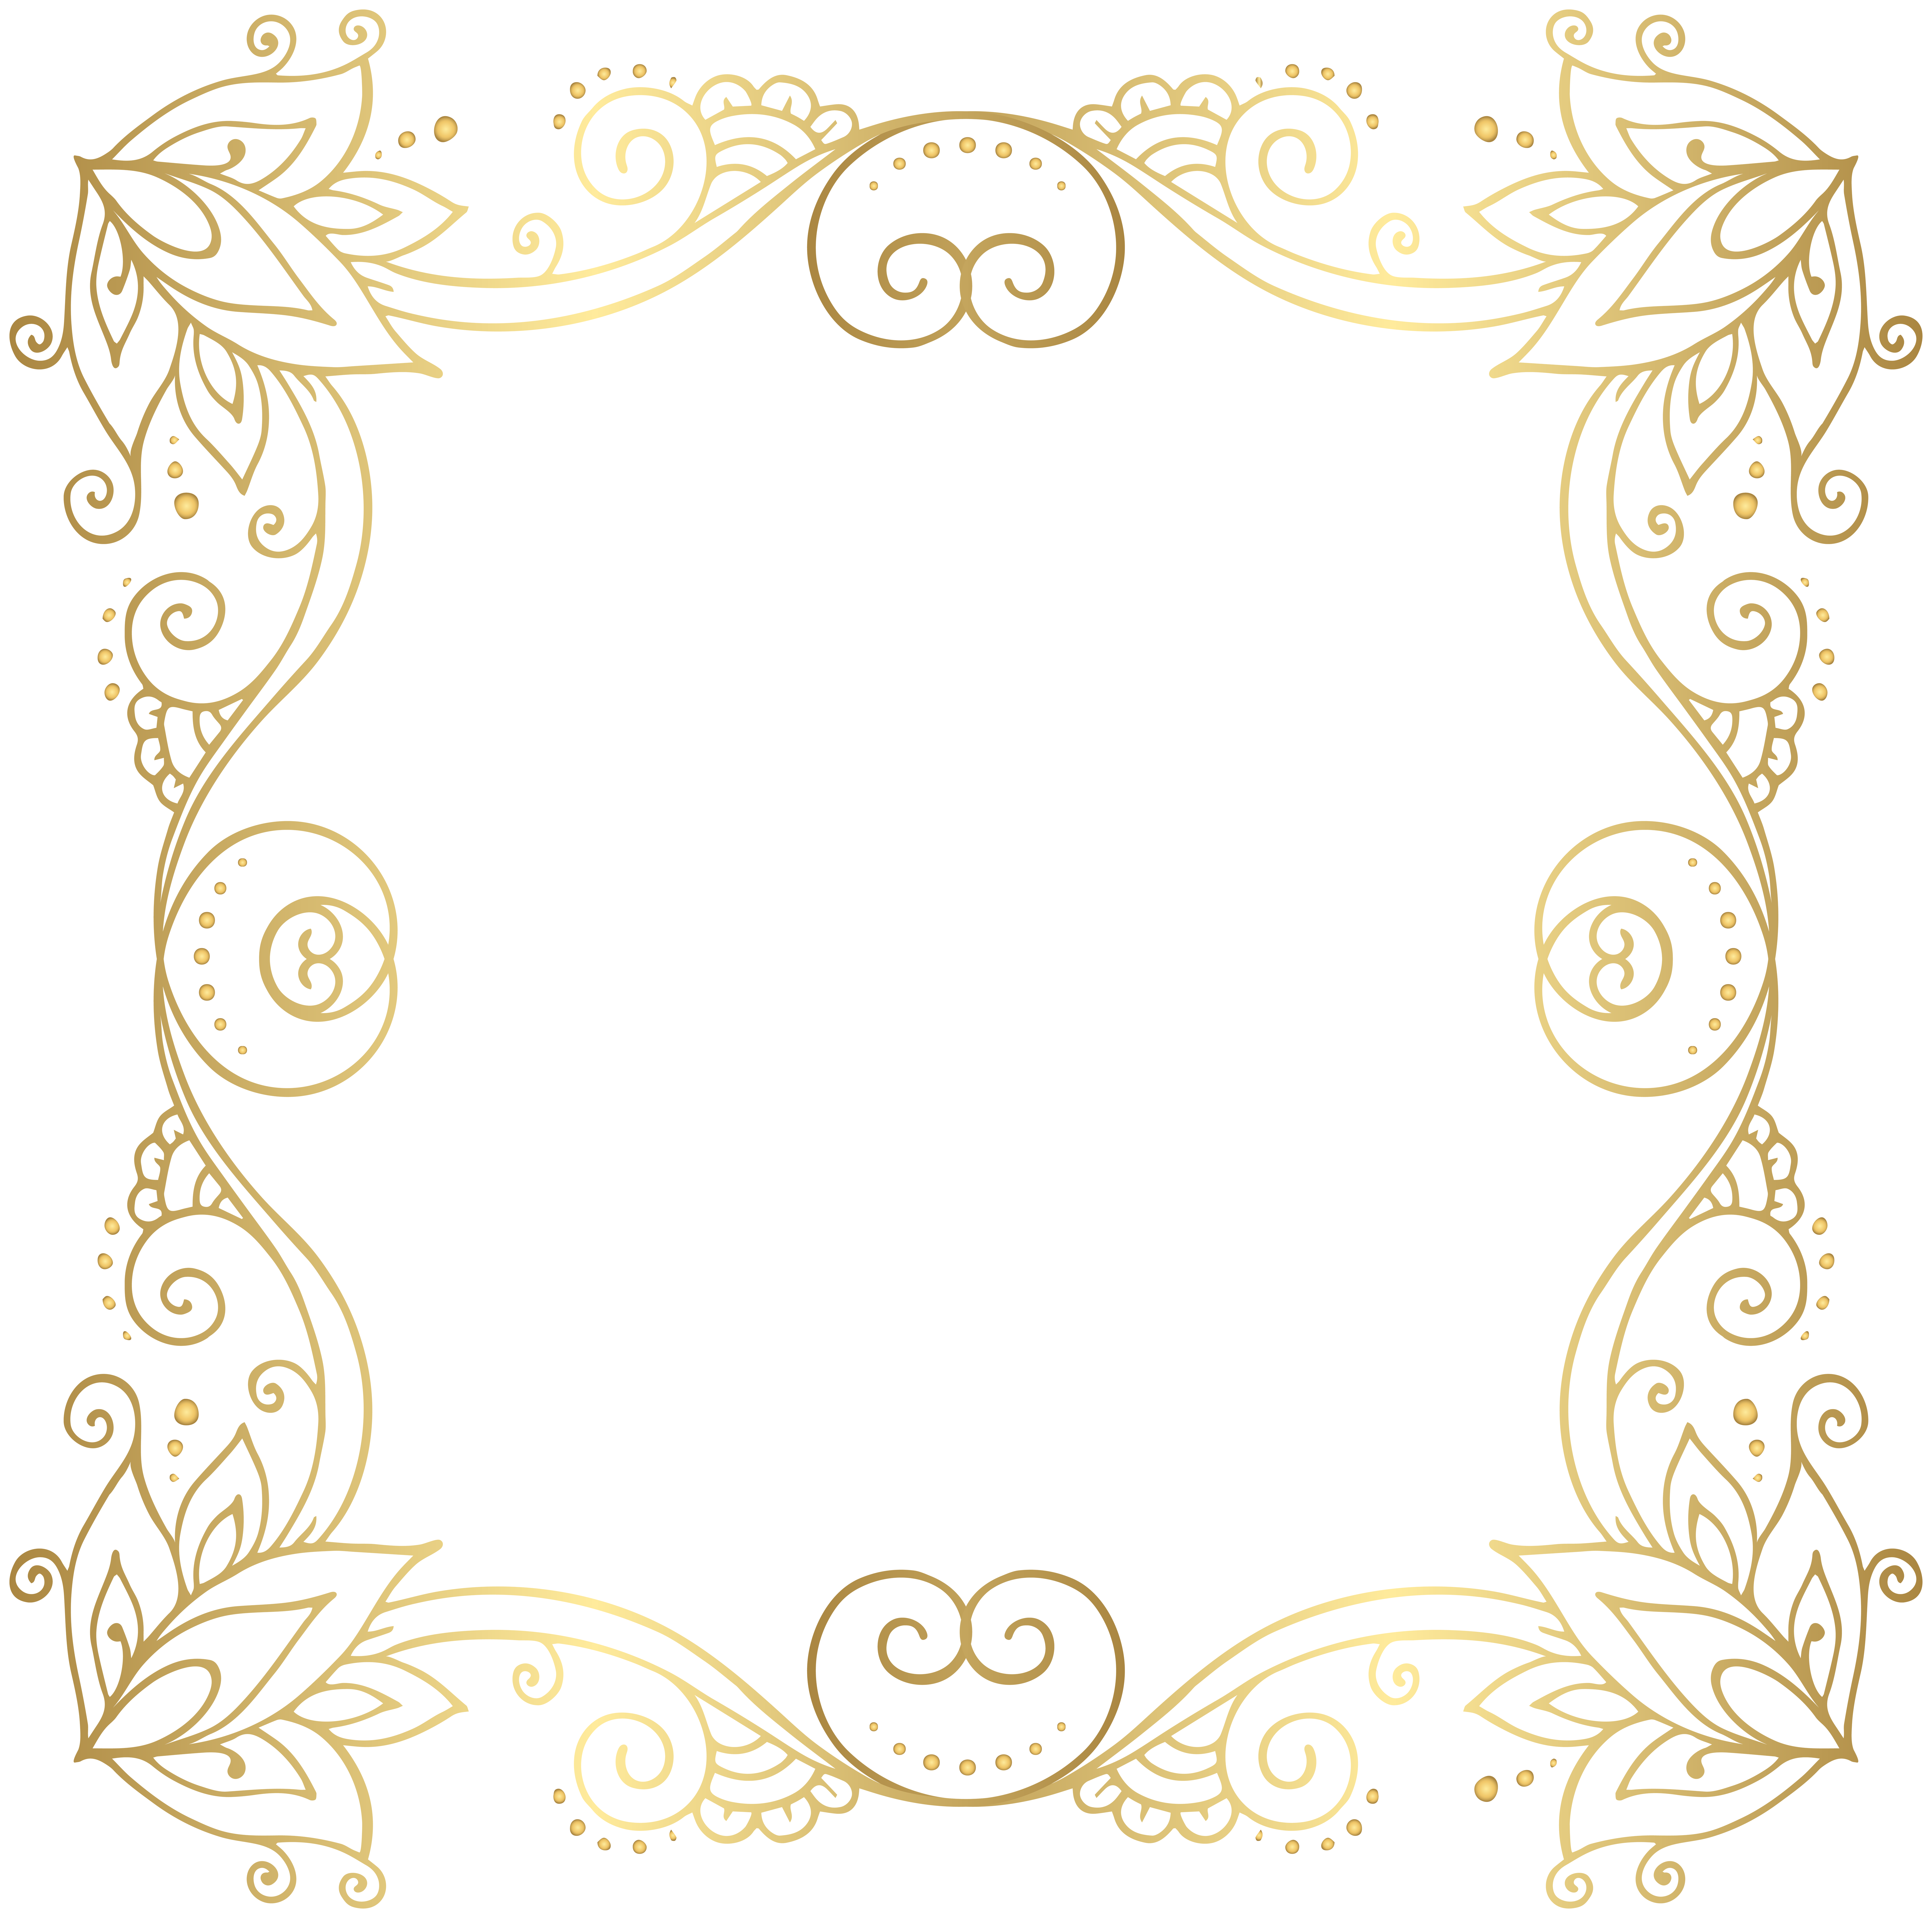 Magic clipart decorative swirl. Gold border frame png